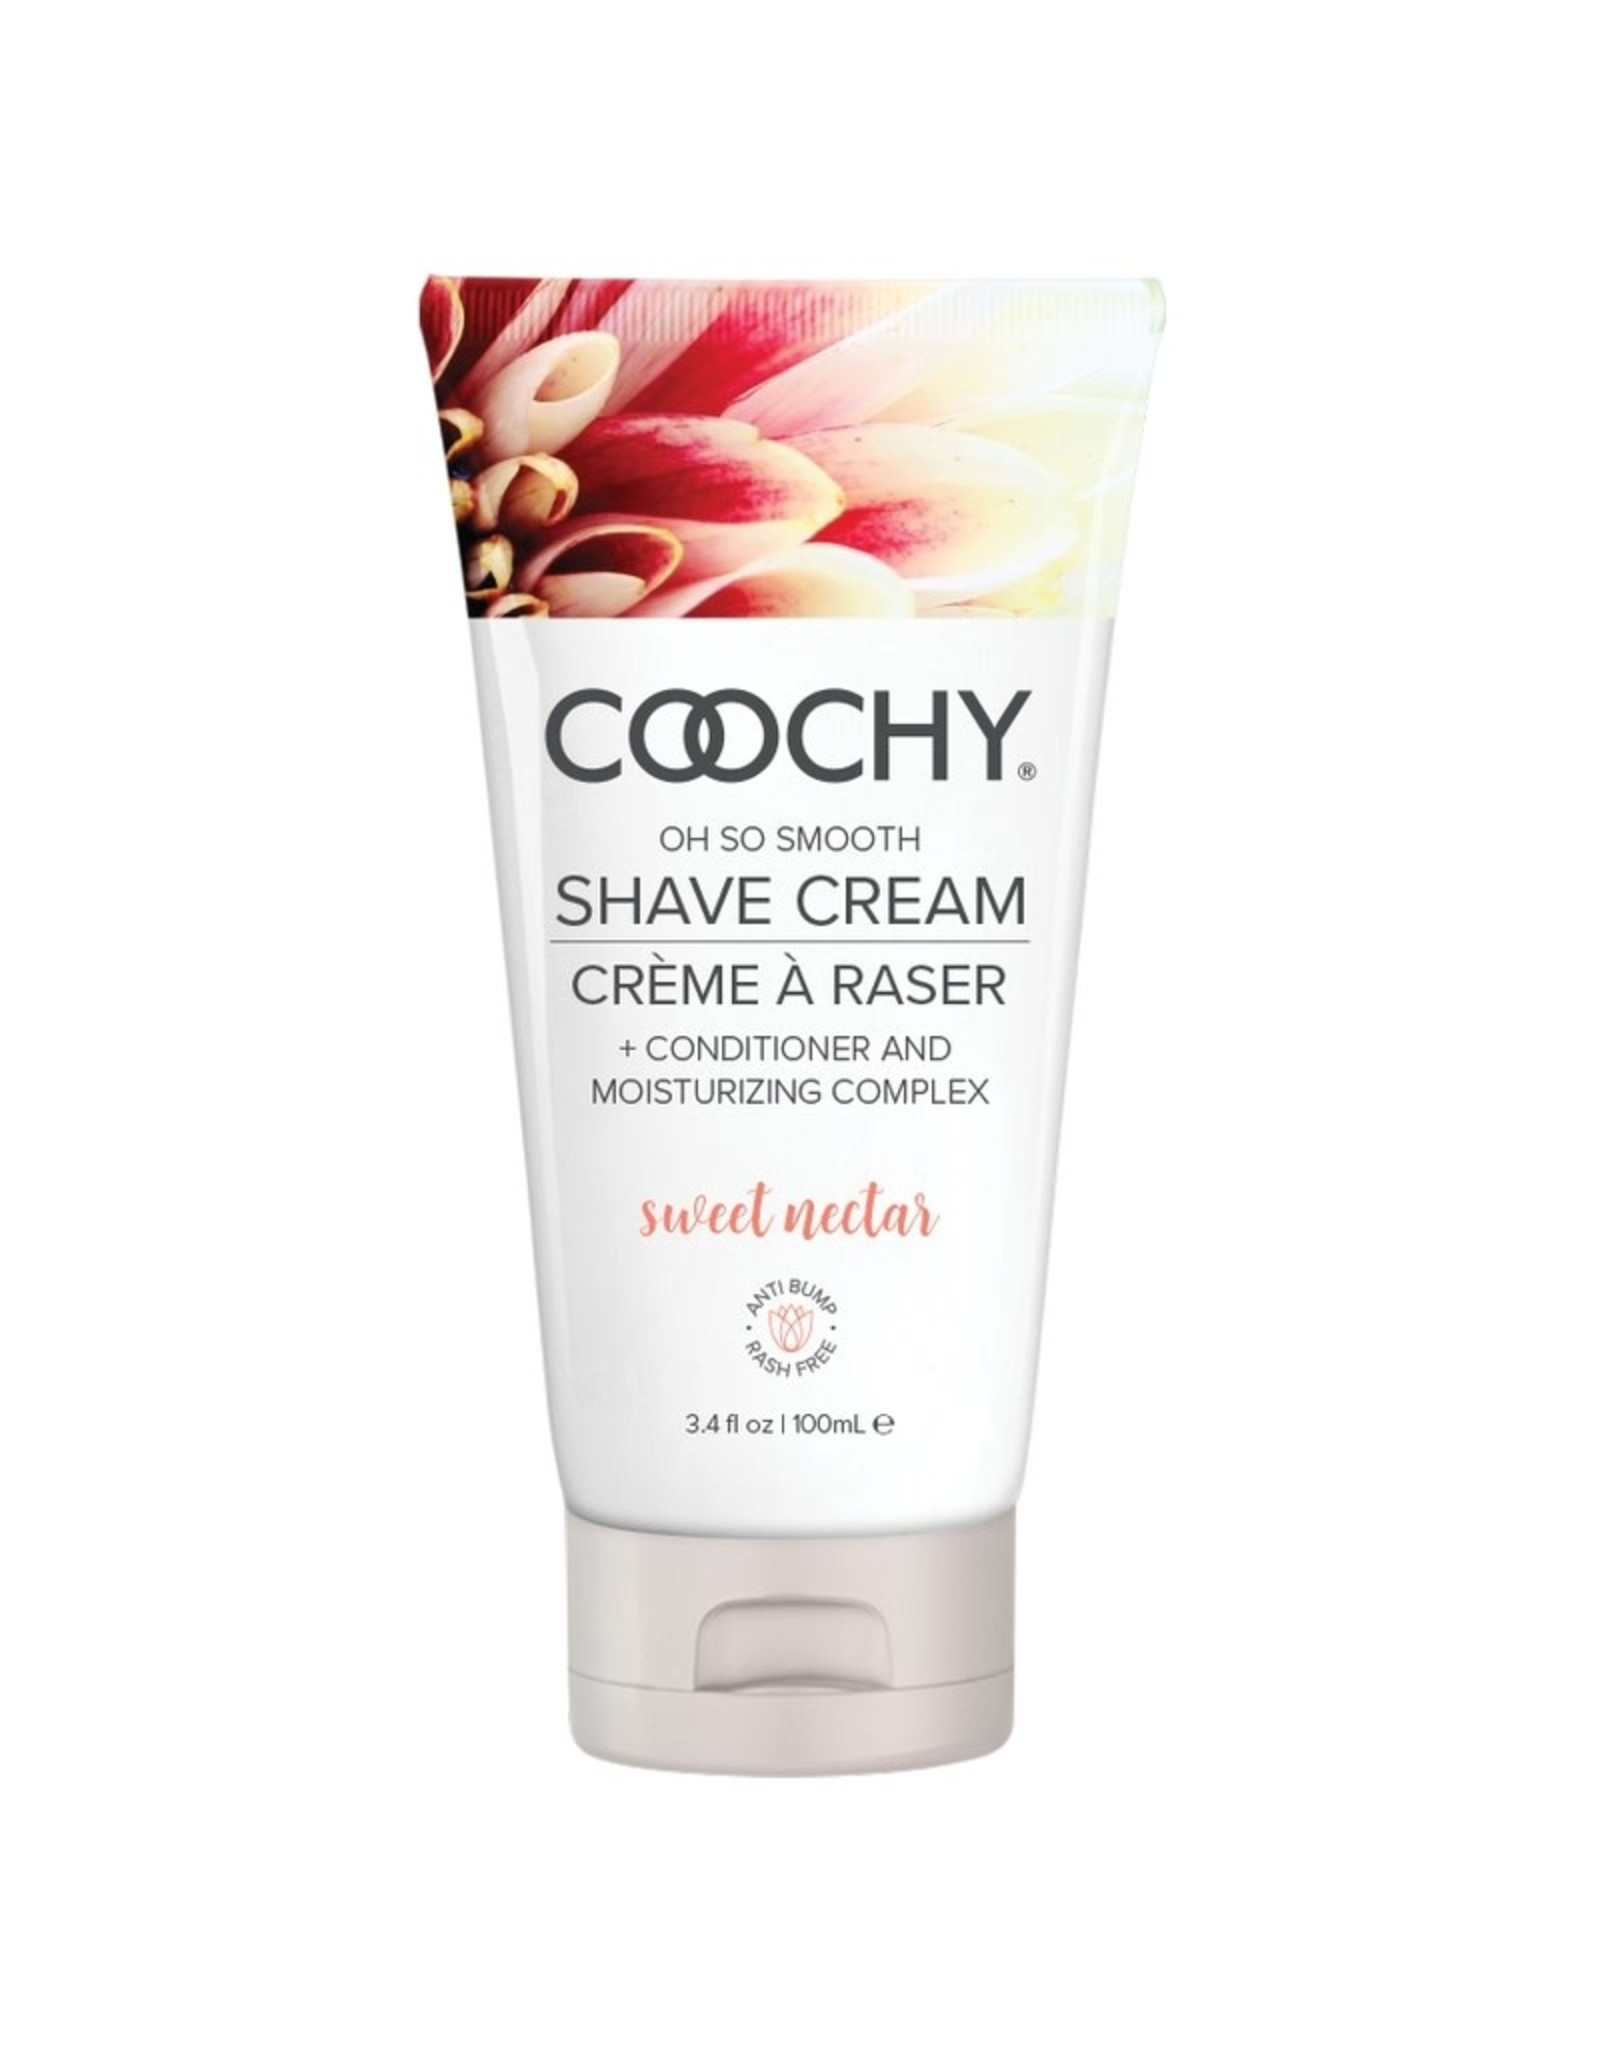 Classic Brands Coochy - Sweet Nectar (3.4 oz)